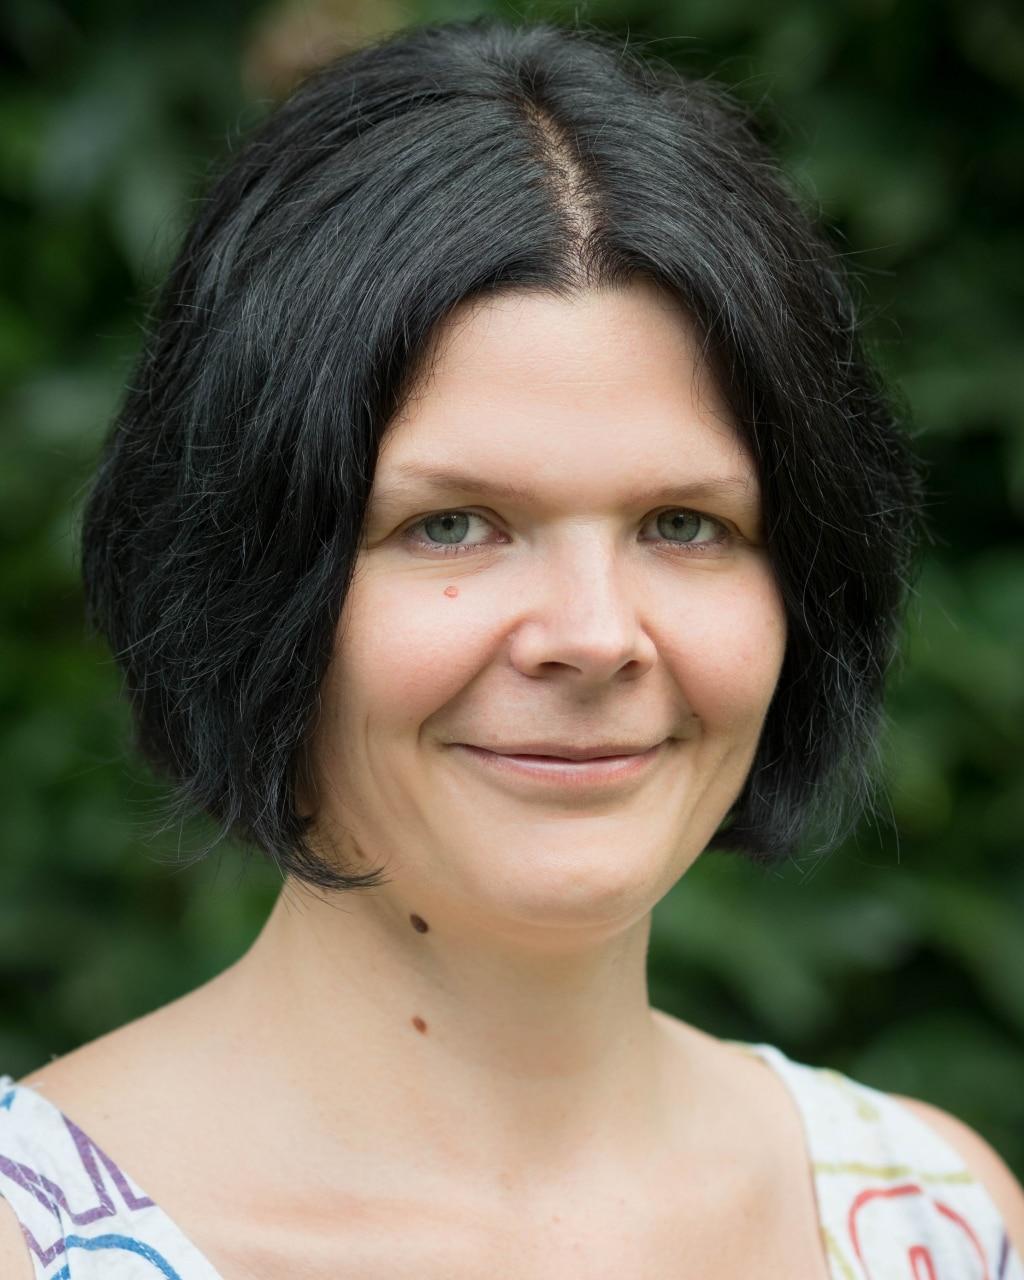 Manuela Klinger Personalwesen